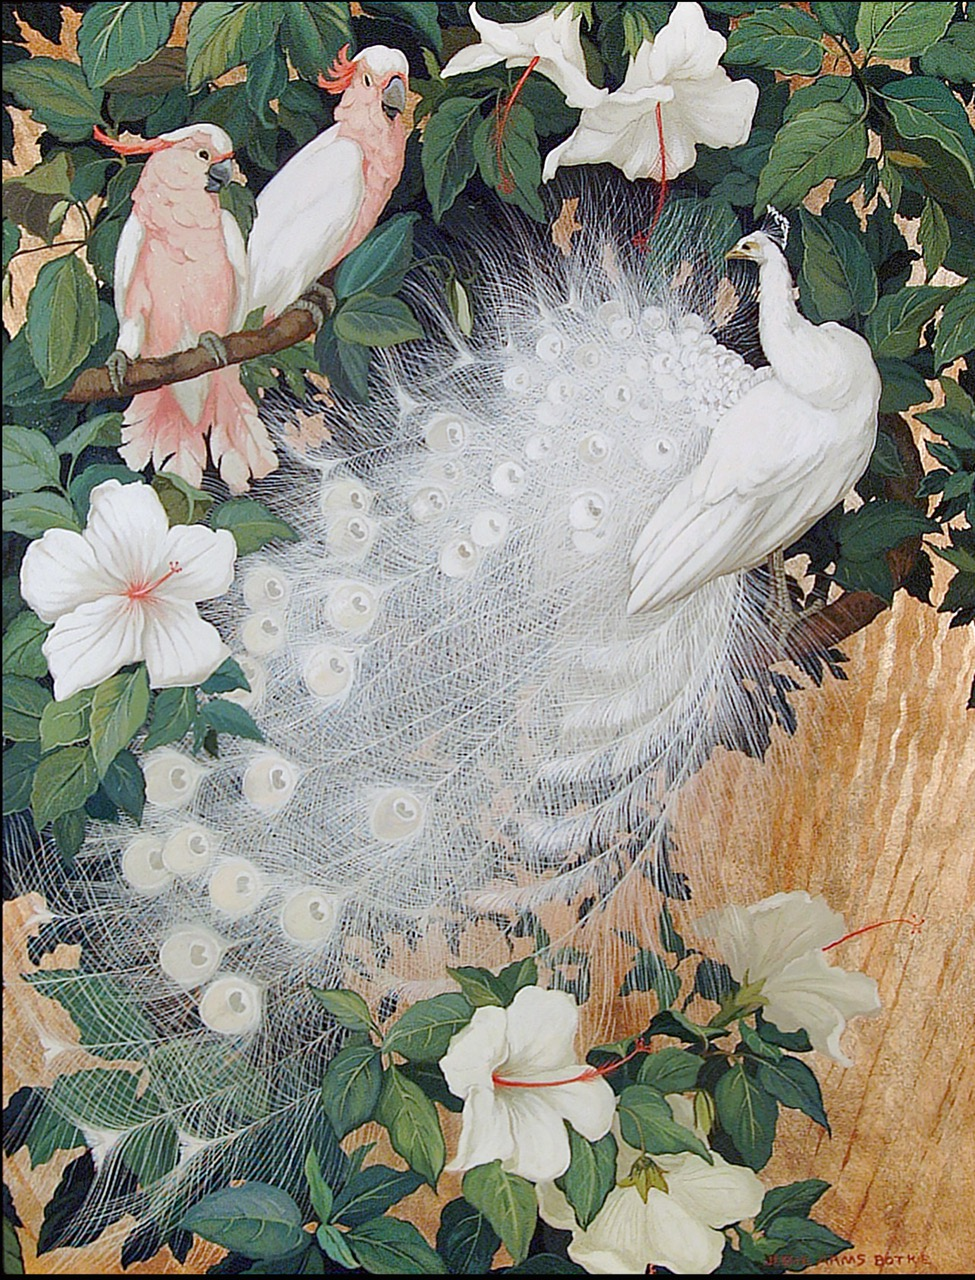 Albino Peacock and Two Cockatoo, c. 1930